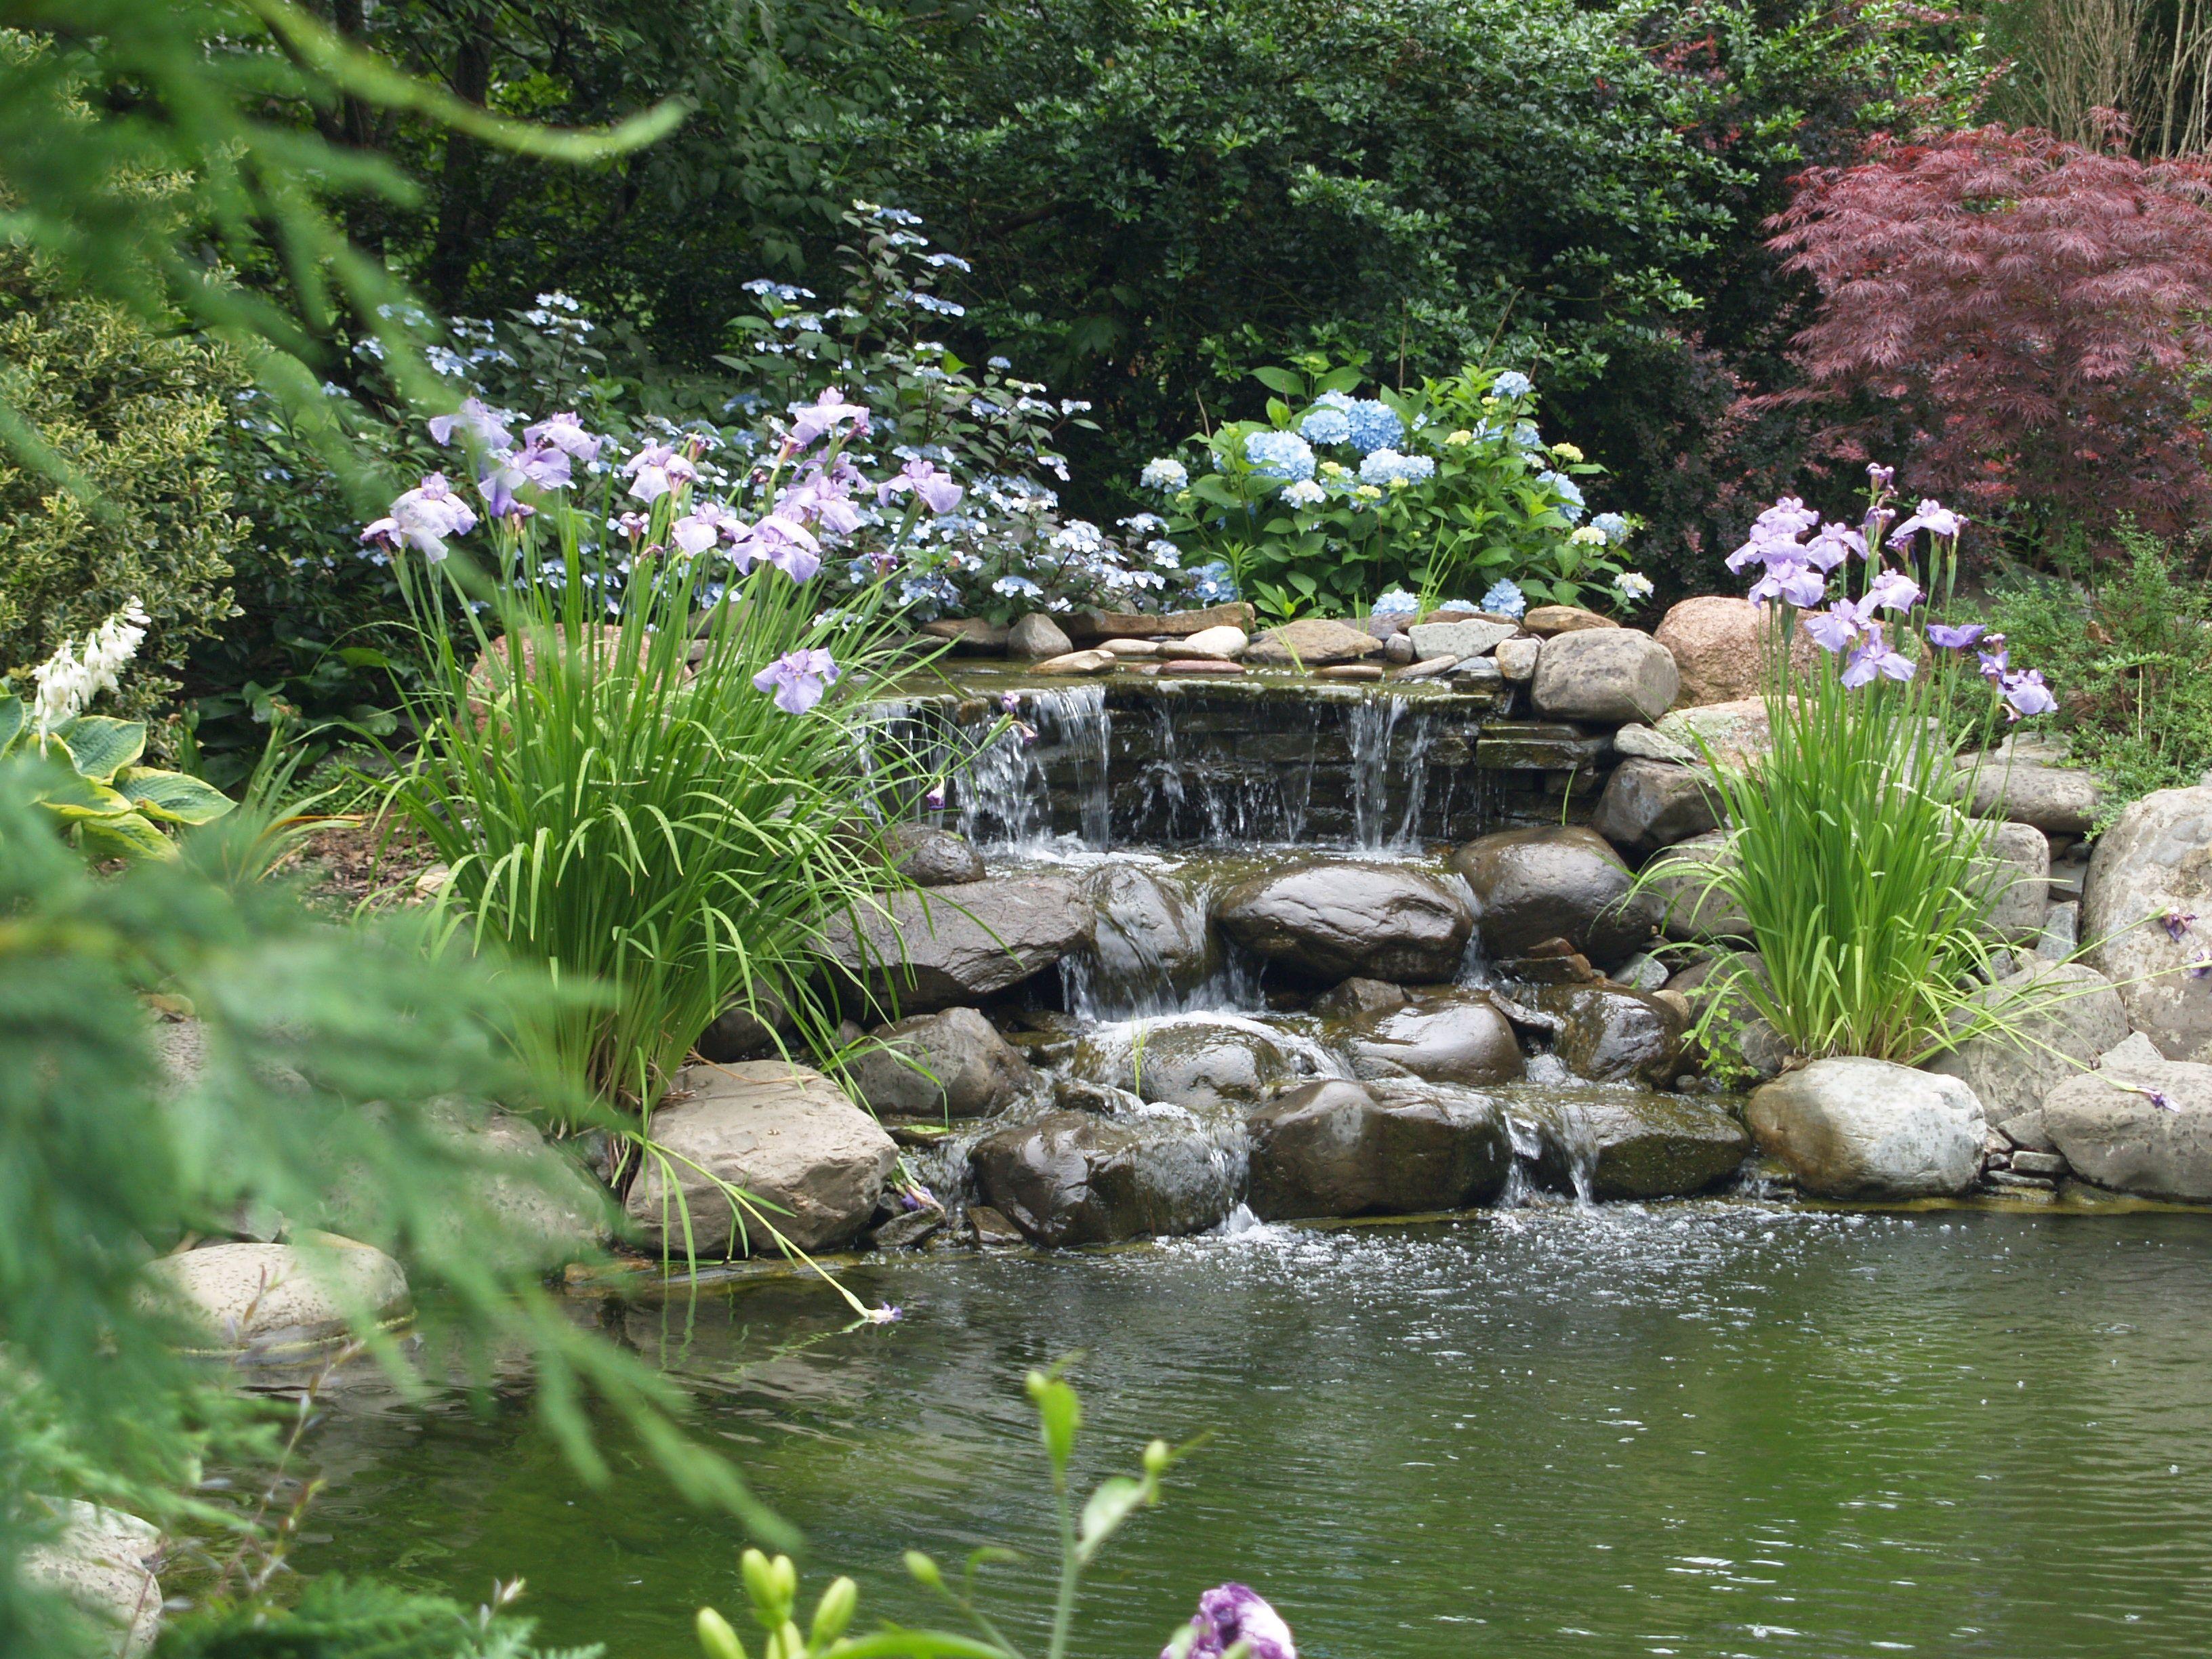 Garden ponds are a delight